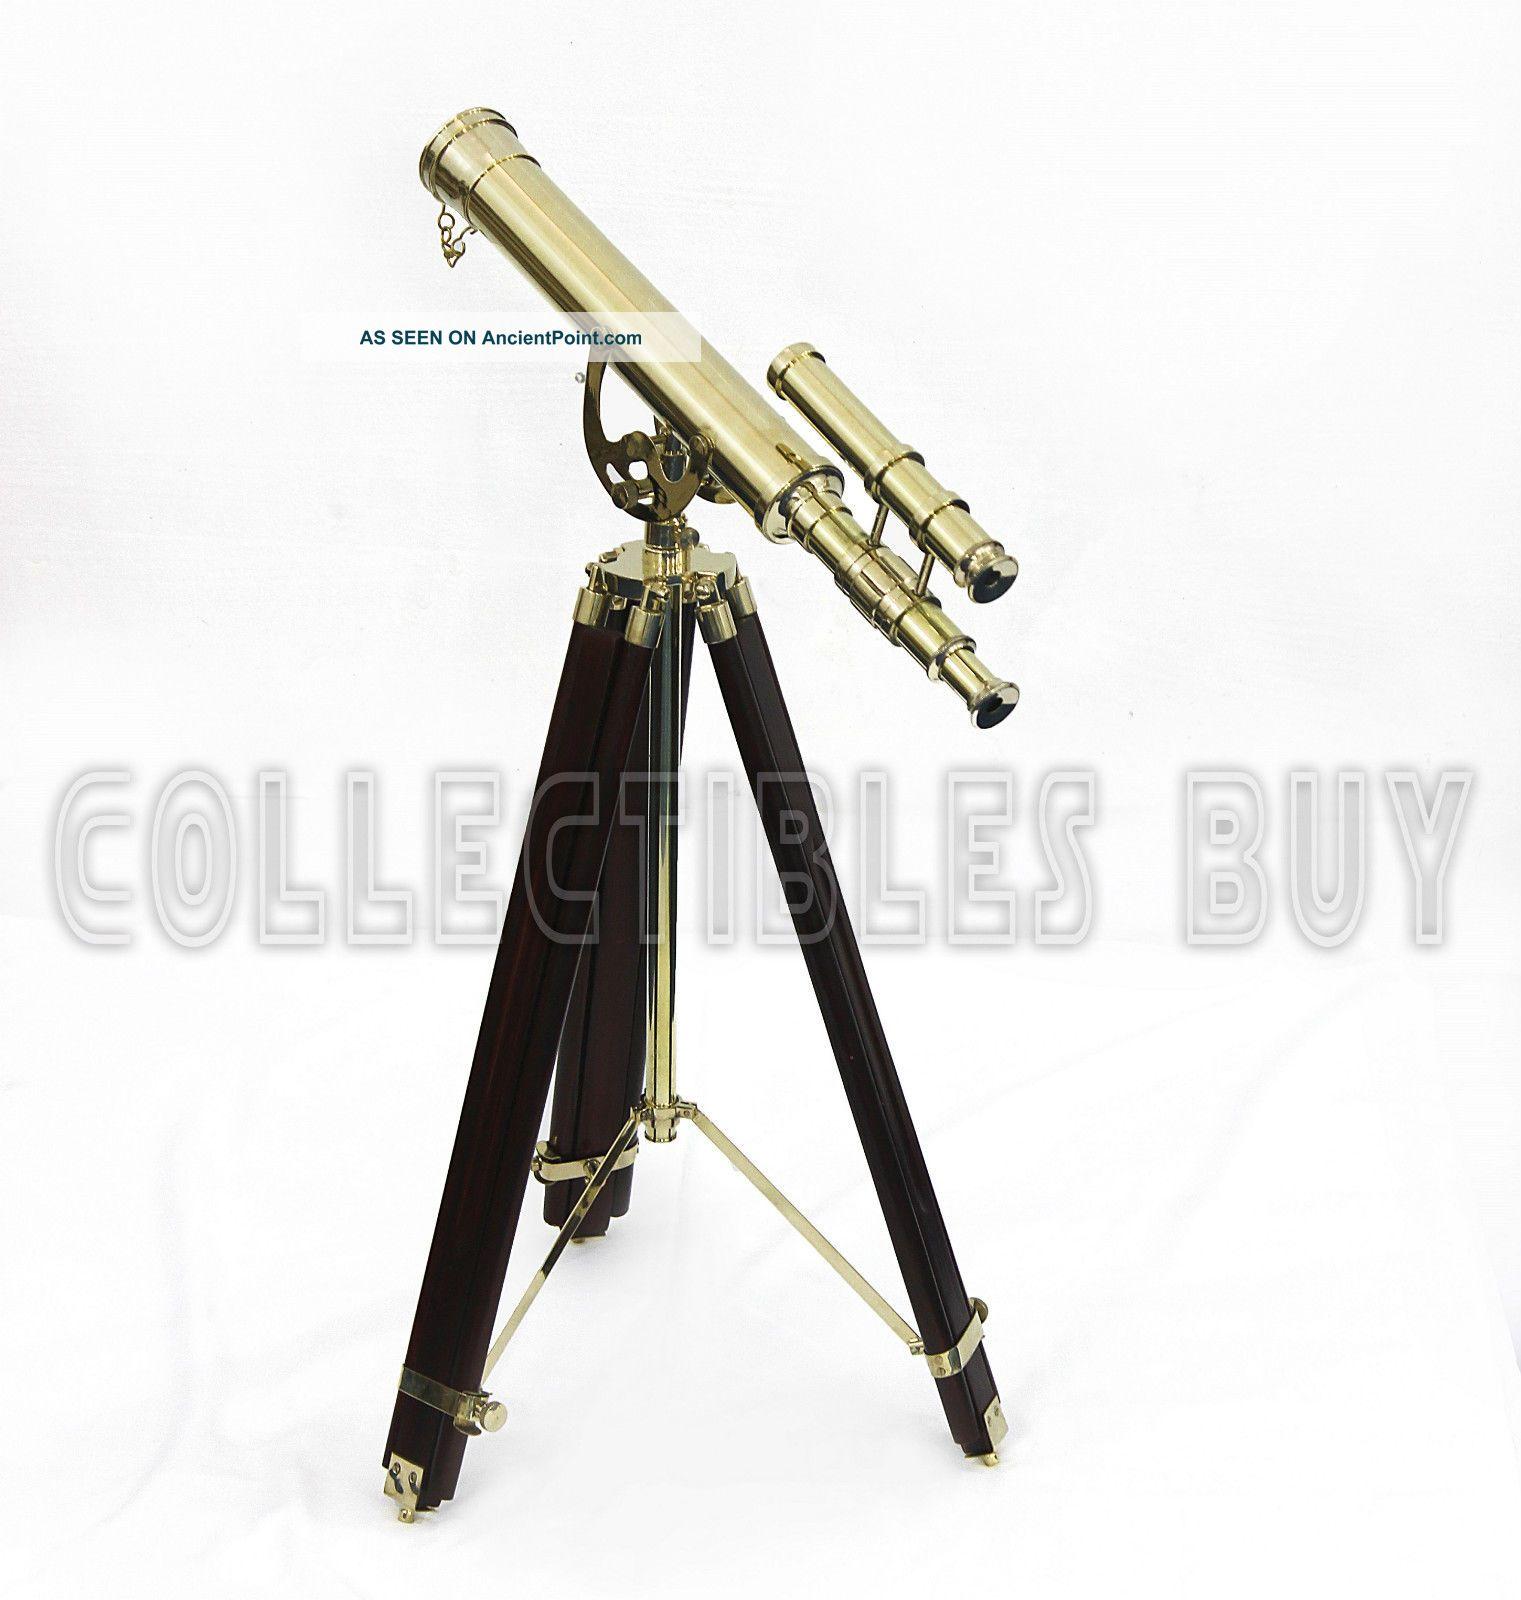 Antique Shiny Brass Finish Marine Double Barrel Telescope Solid Red Wood Tripod Telescopes photo